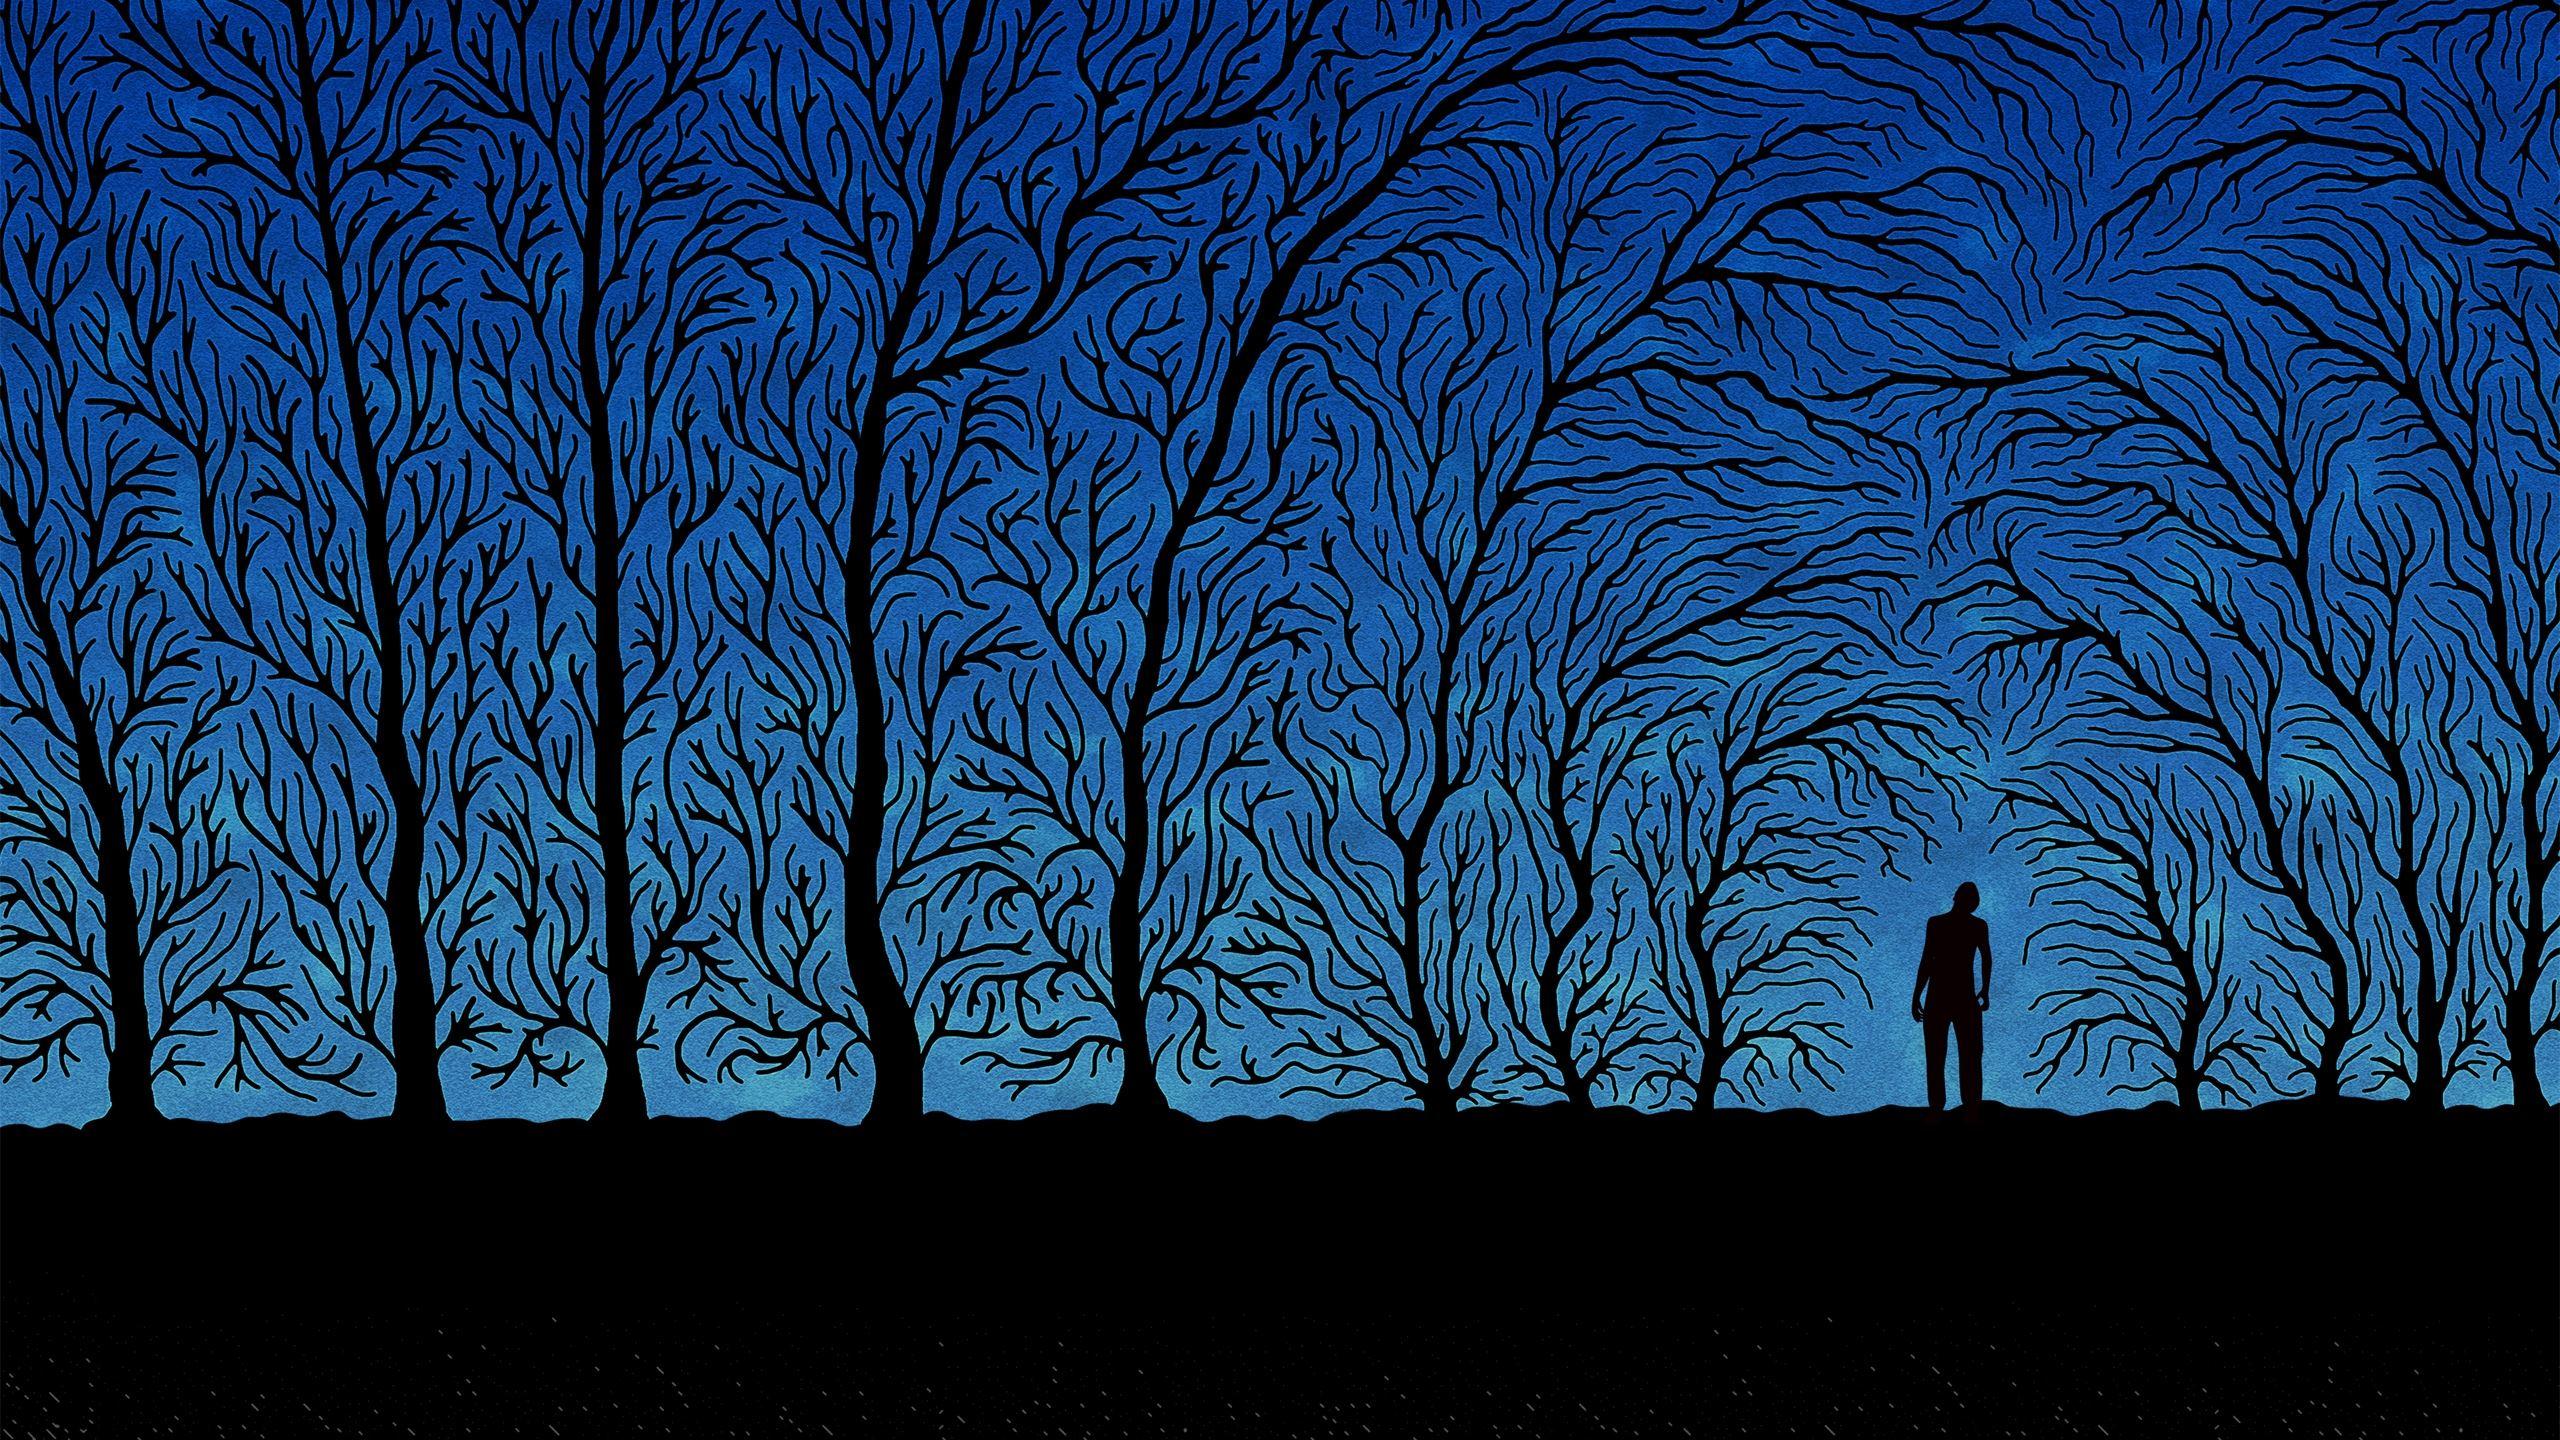 Black forest Mac Wallpaper Download | Free Mac Wallpapers ...